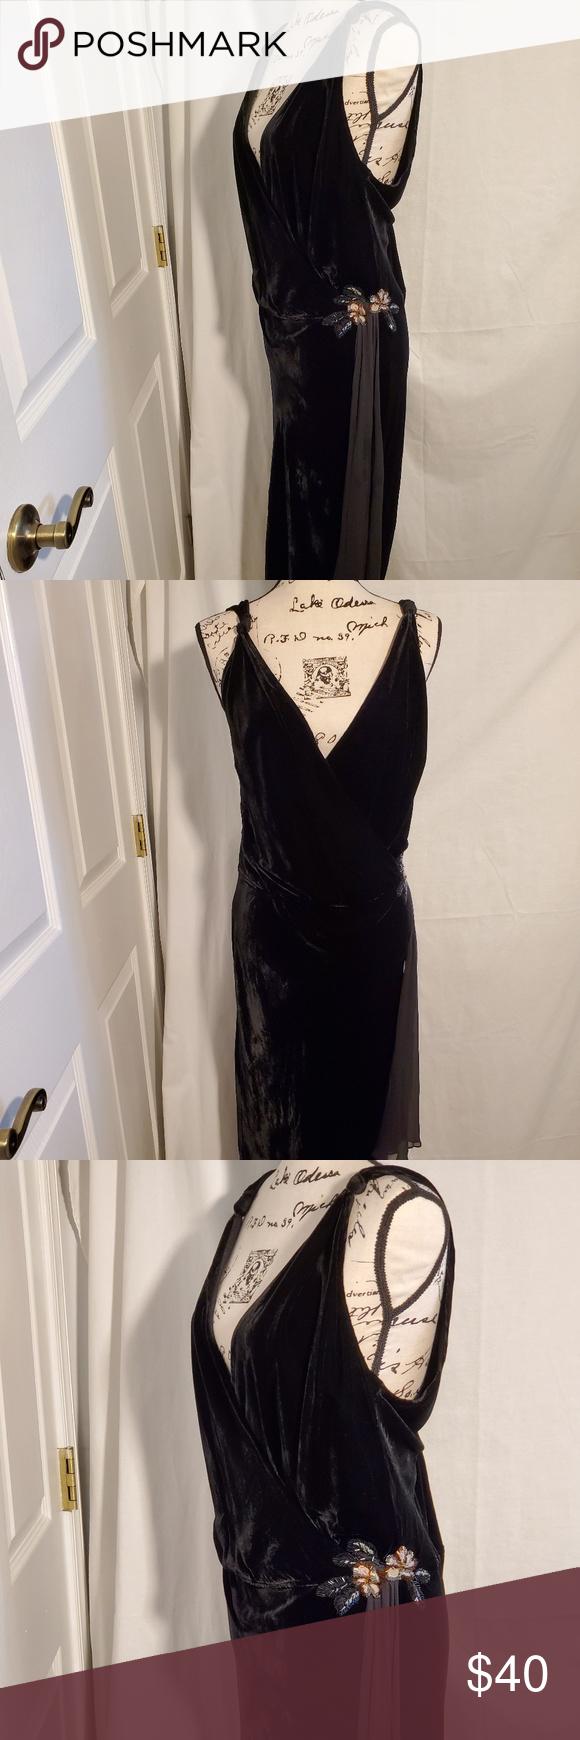 Newport News Black Velvet Cocktail Dress Size 18 Black Velvet Cocktail Velvet Cocktail Dress Size 18 Dress [ 1740 x 580 Pixel ]